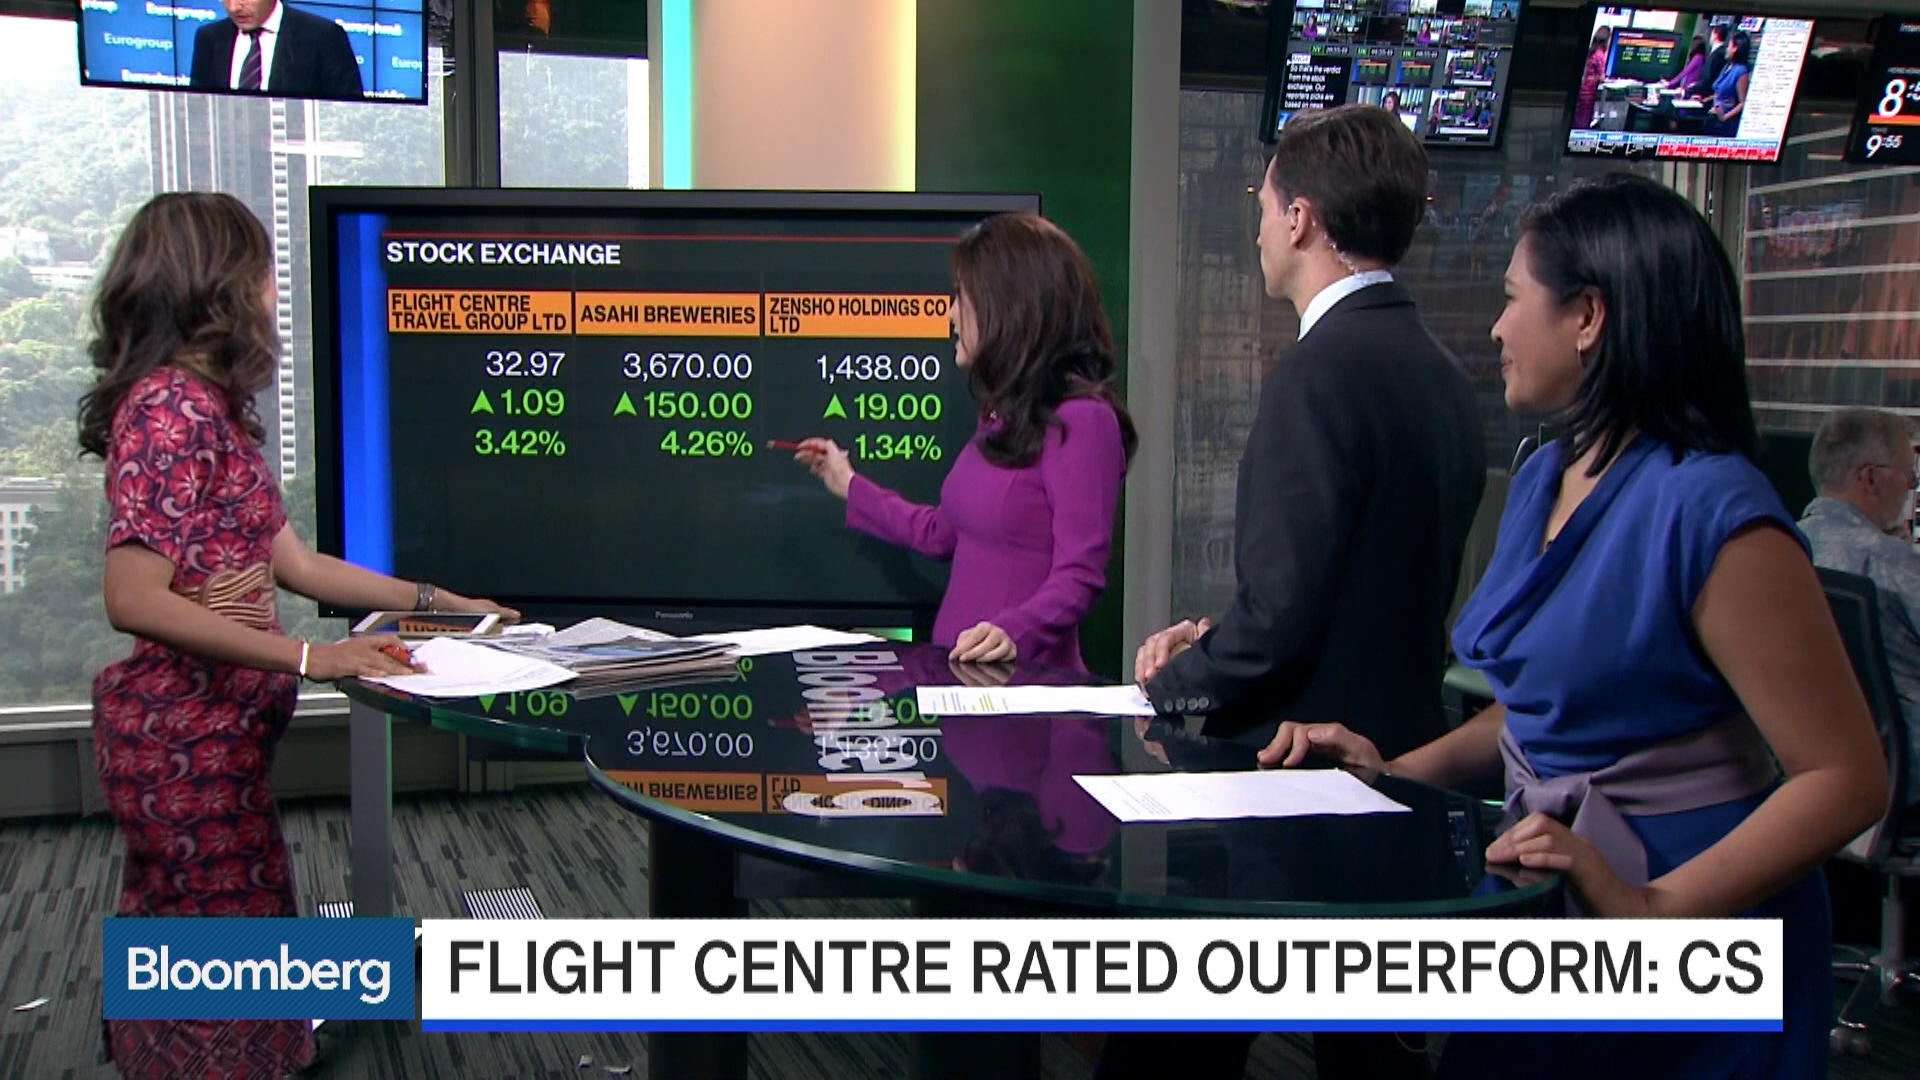 Boeing deepens jetliner job cuts as risk of sales downturn looms bloomberg - Boeing Deepens Jetliner Job Cuts As Risk Of Sales Downturn Looms Bloomberg